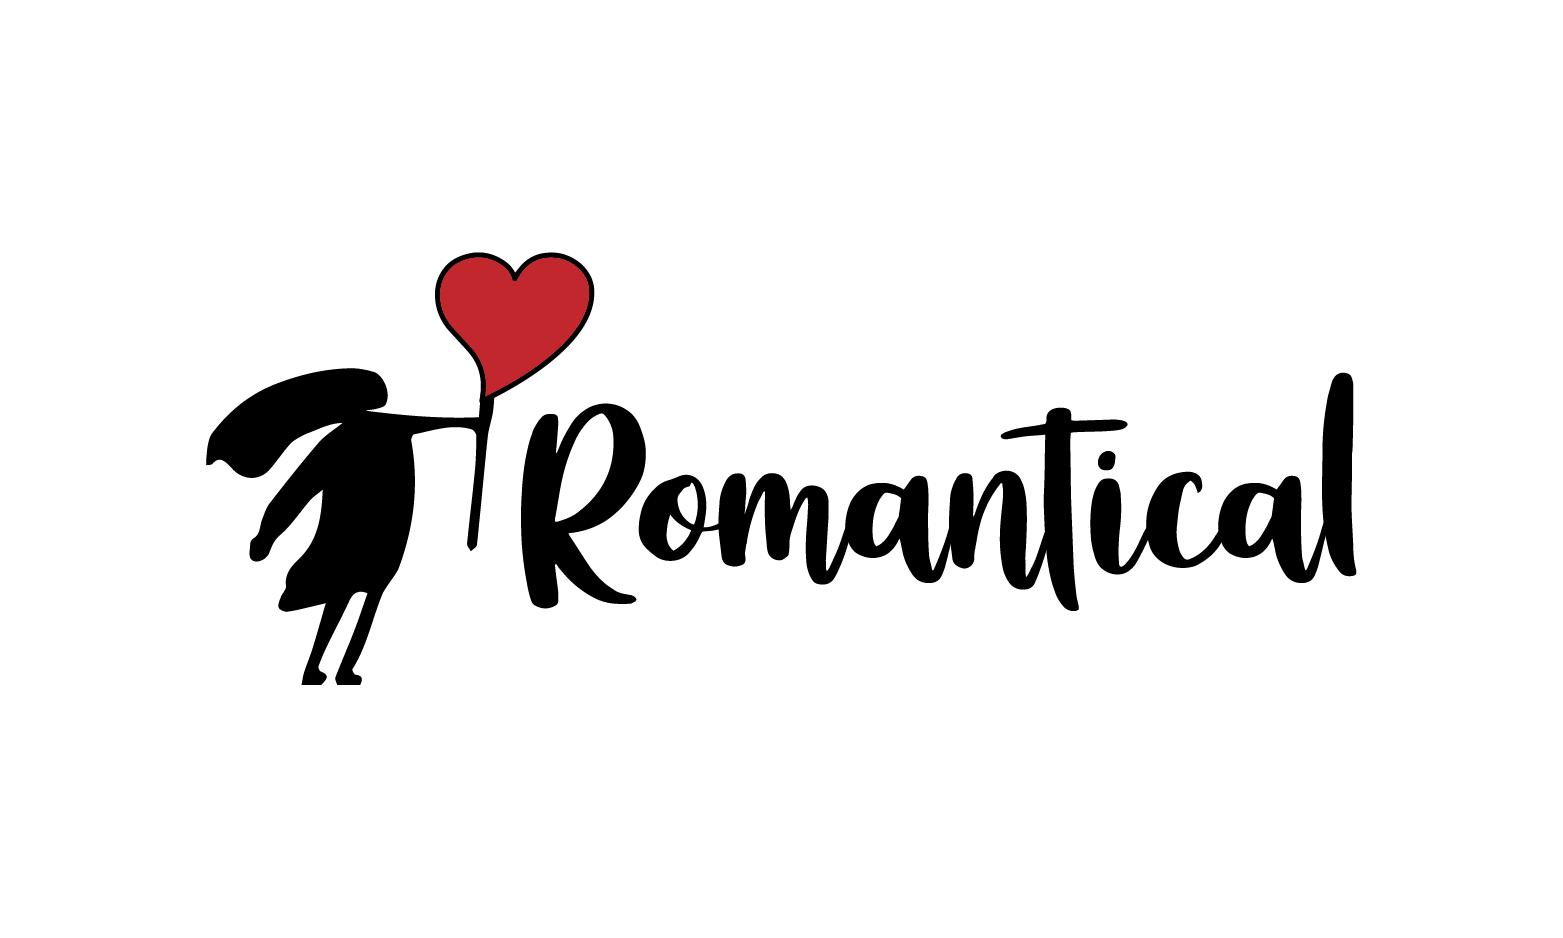 Romantical.ly